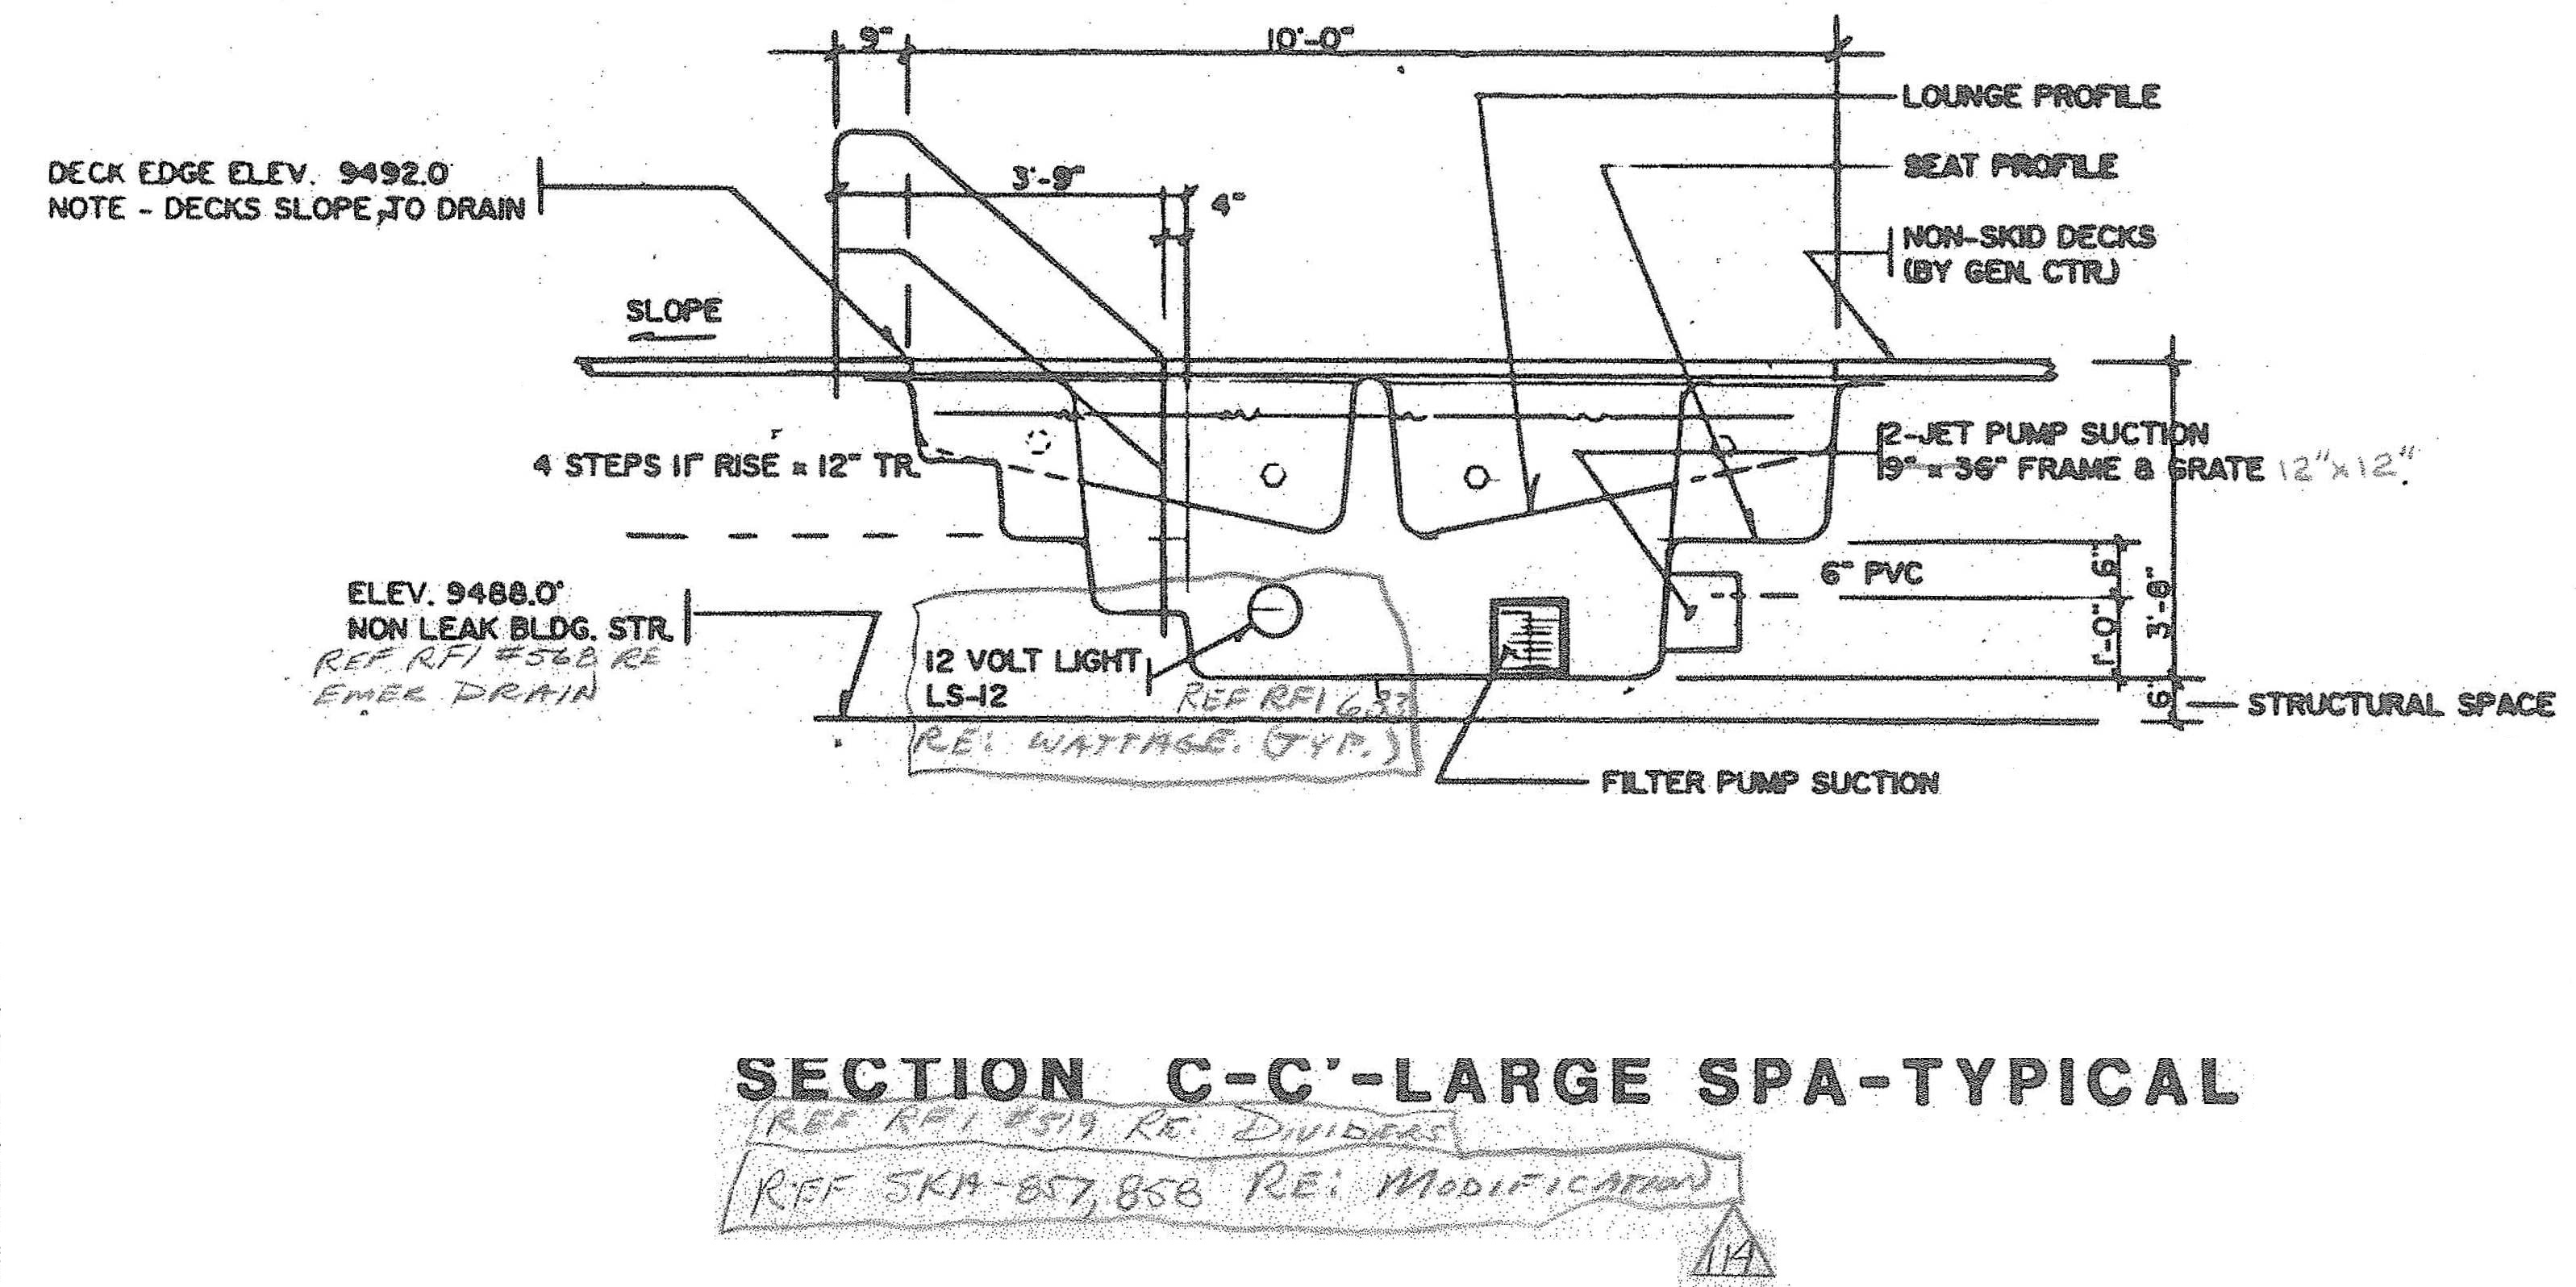 ELEVATION SECTION C-C KIVA SPA-004